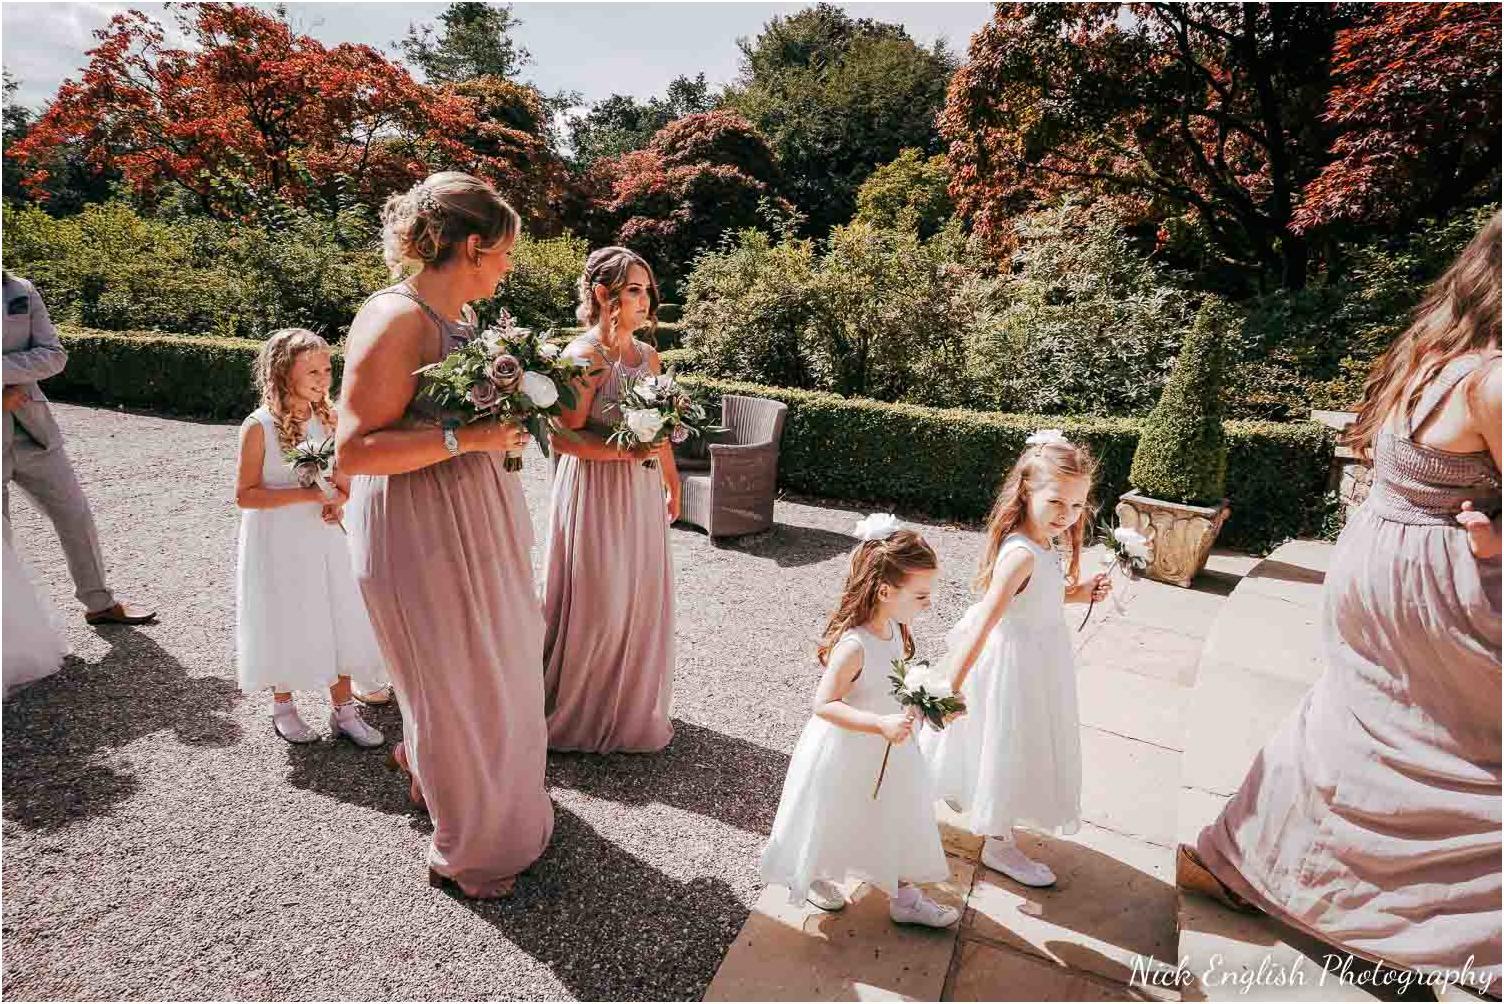 Eaves_Hall_Outdoor_Wedding-33.jpg